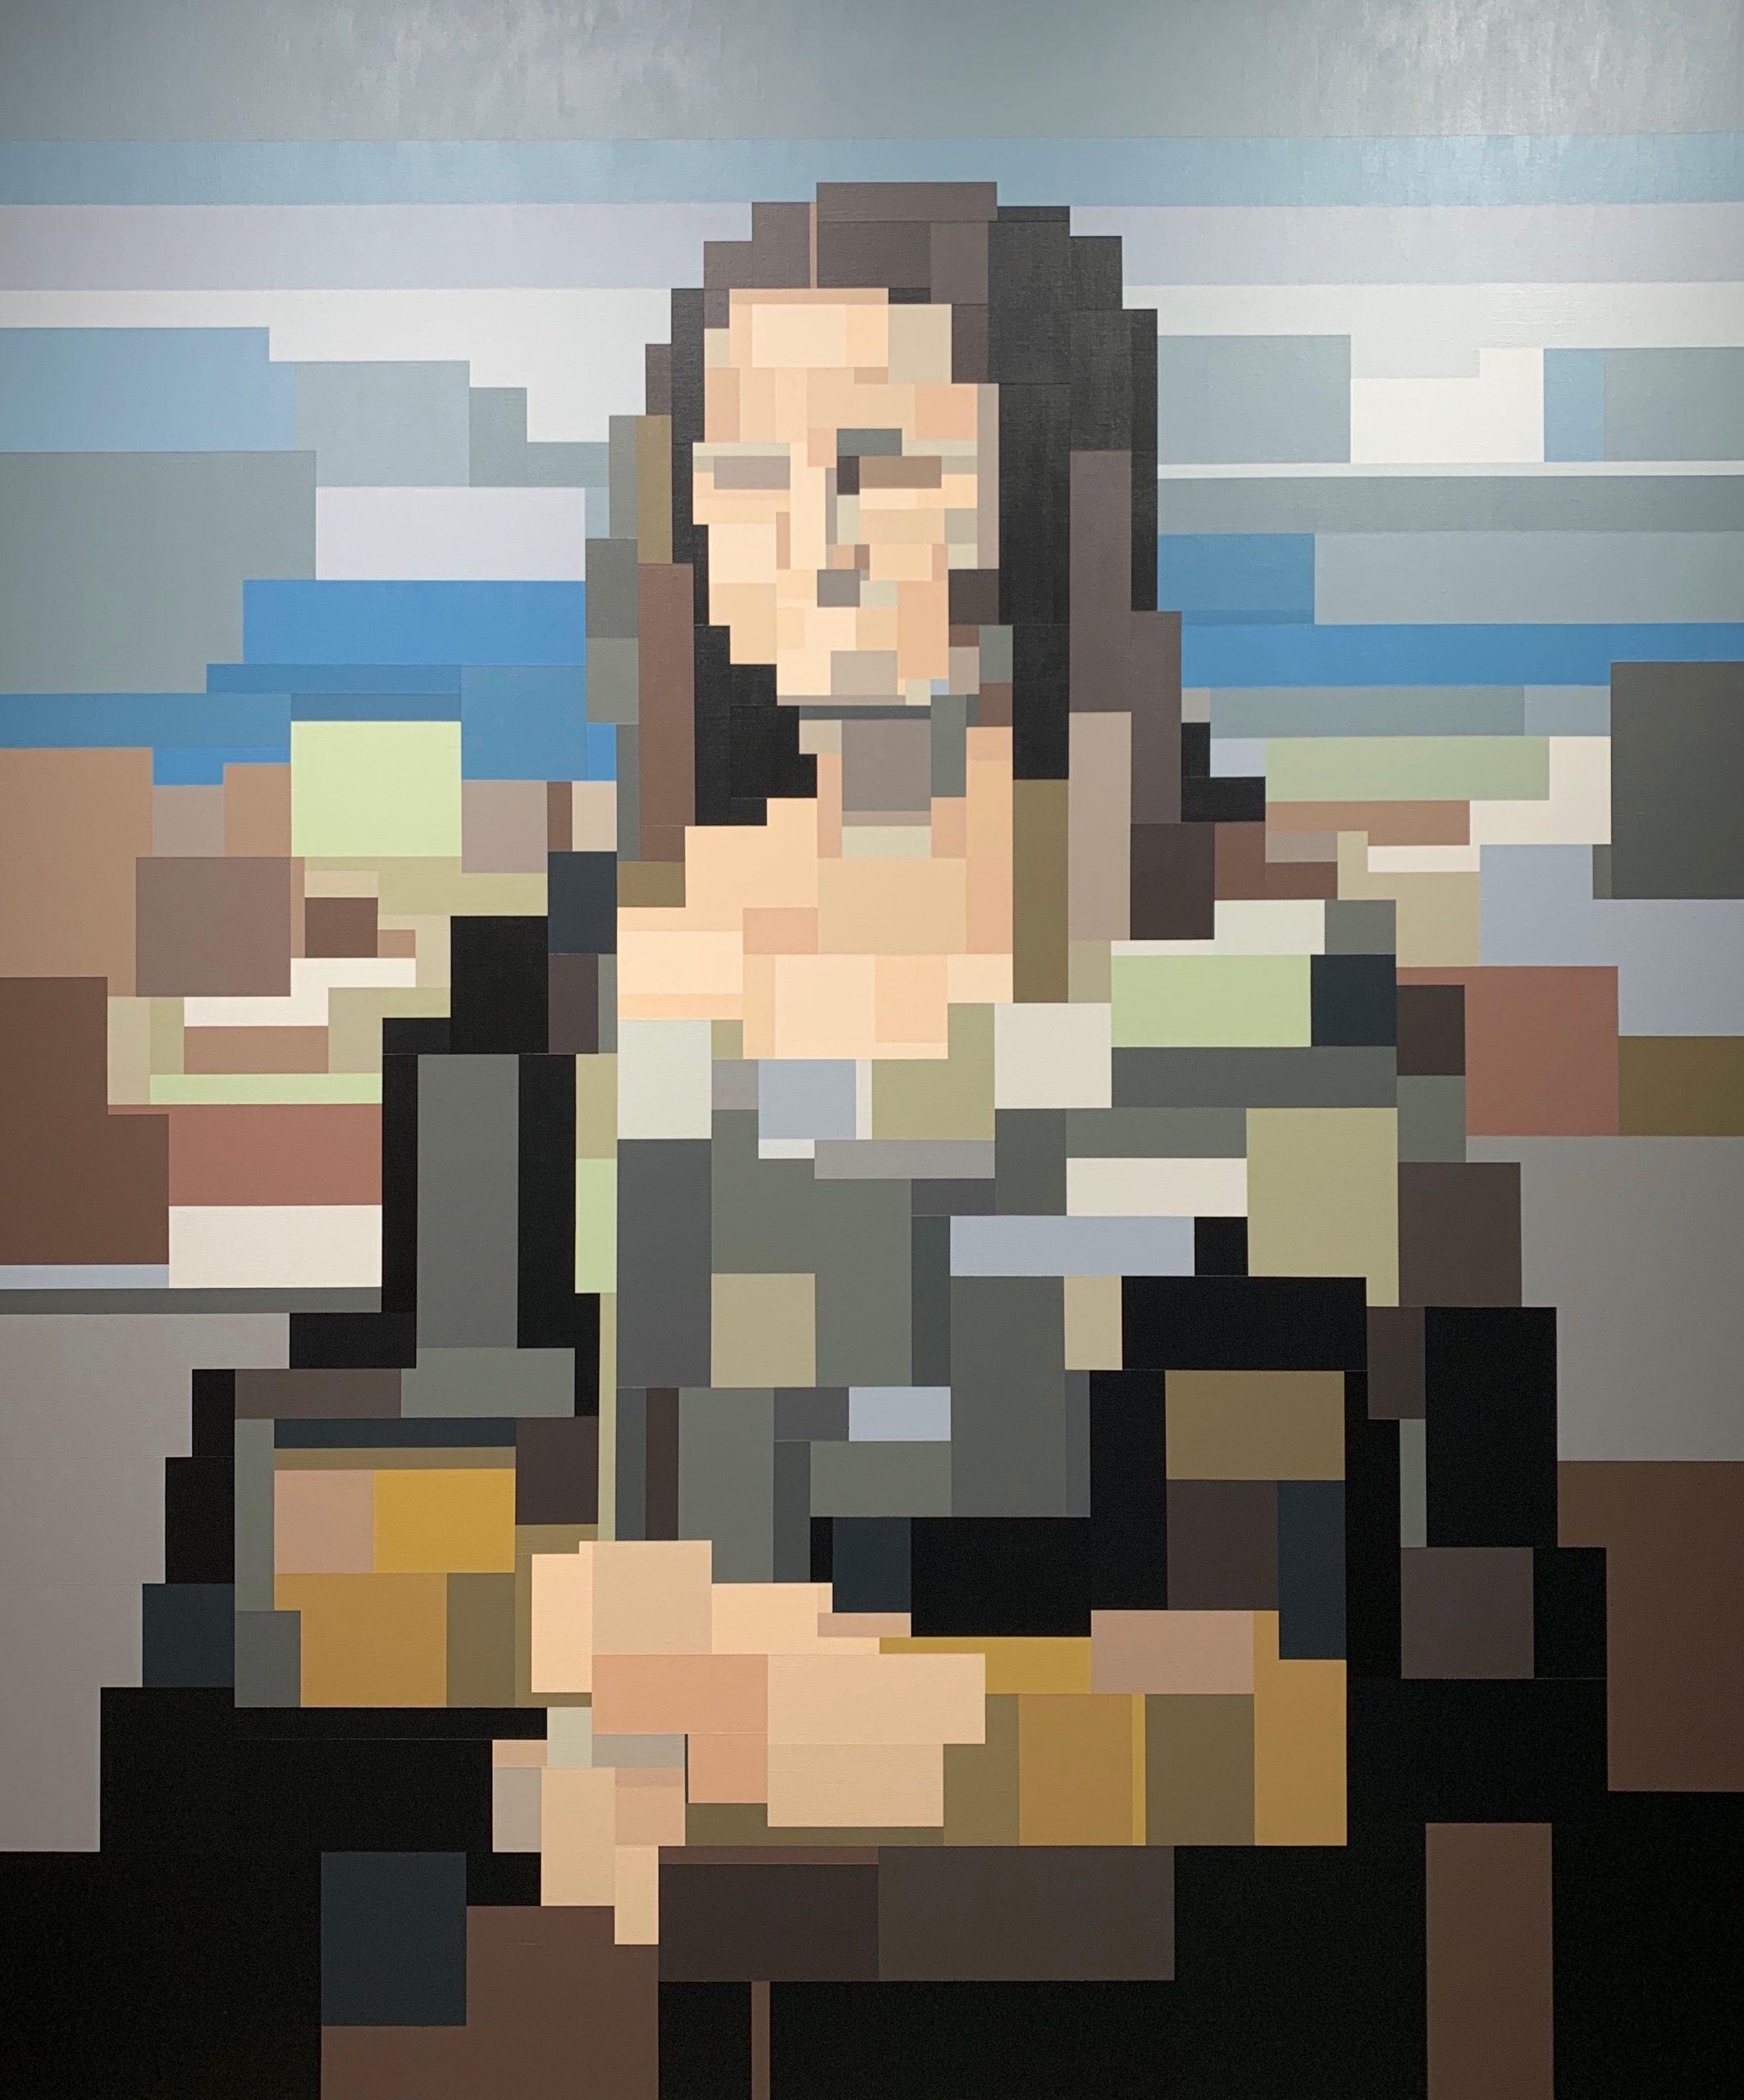 Mona Lisa by Adam Lister